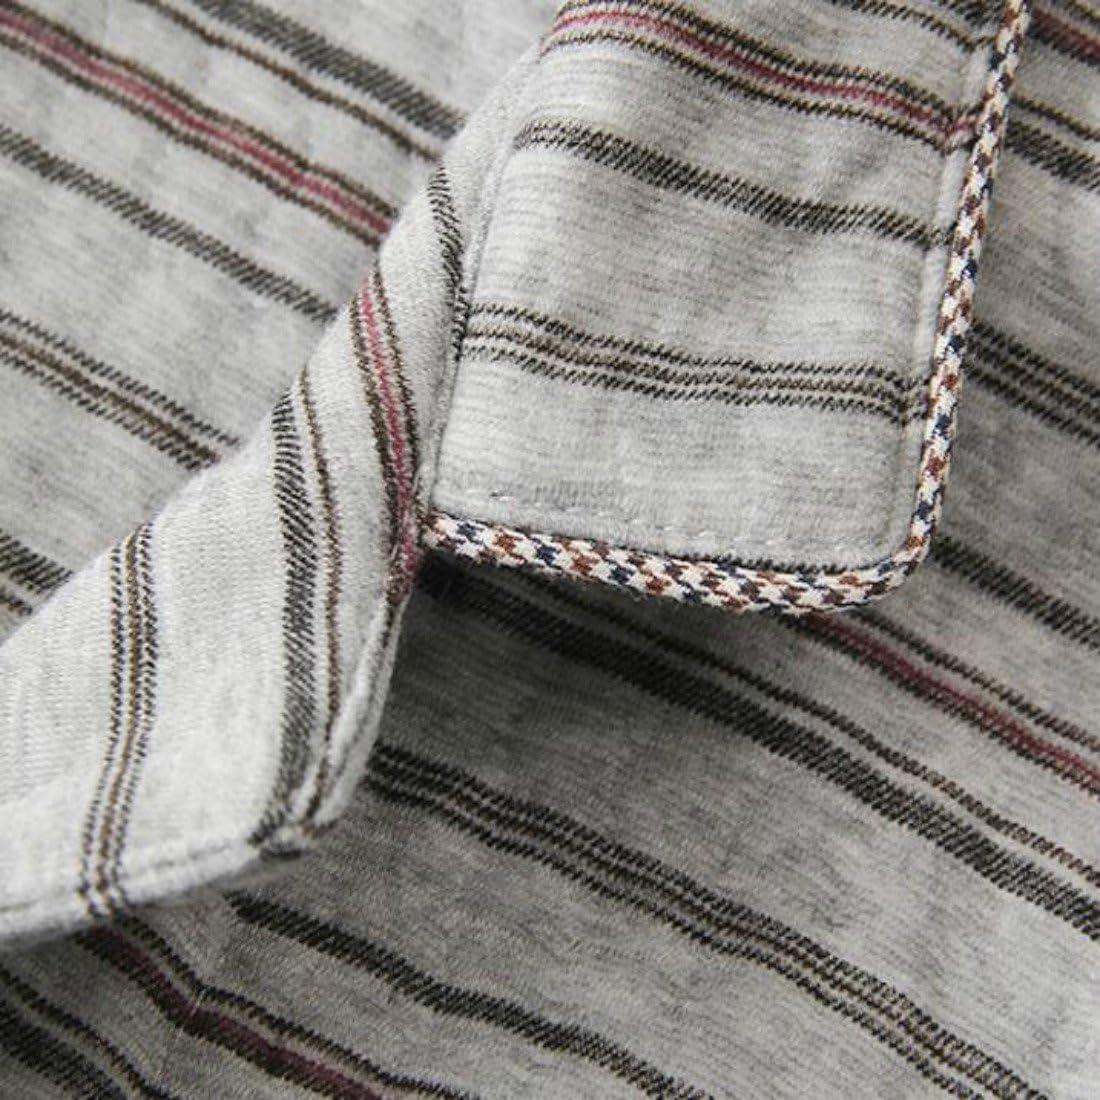 Colygamala Men's Cotton Flannel Long Sleeve Sleep Top and Bottom Pajama Set Lounge Set